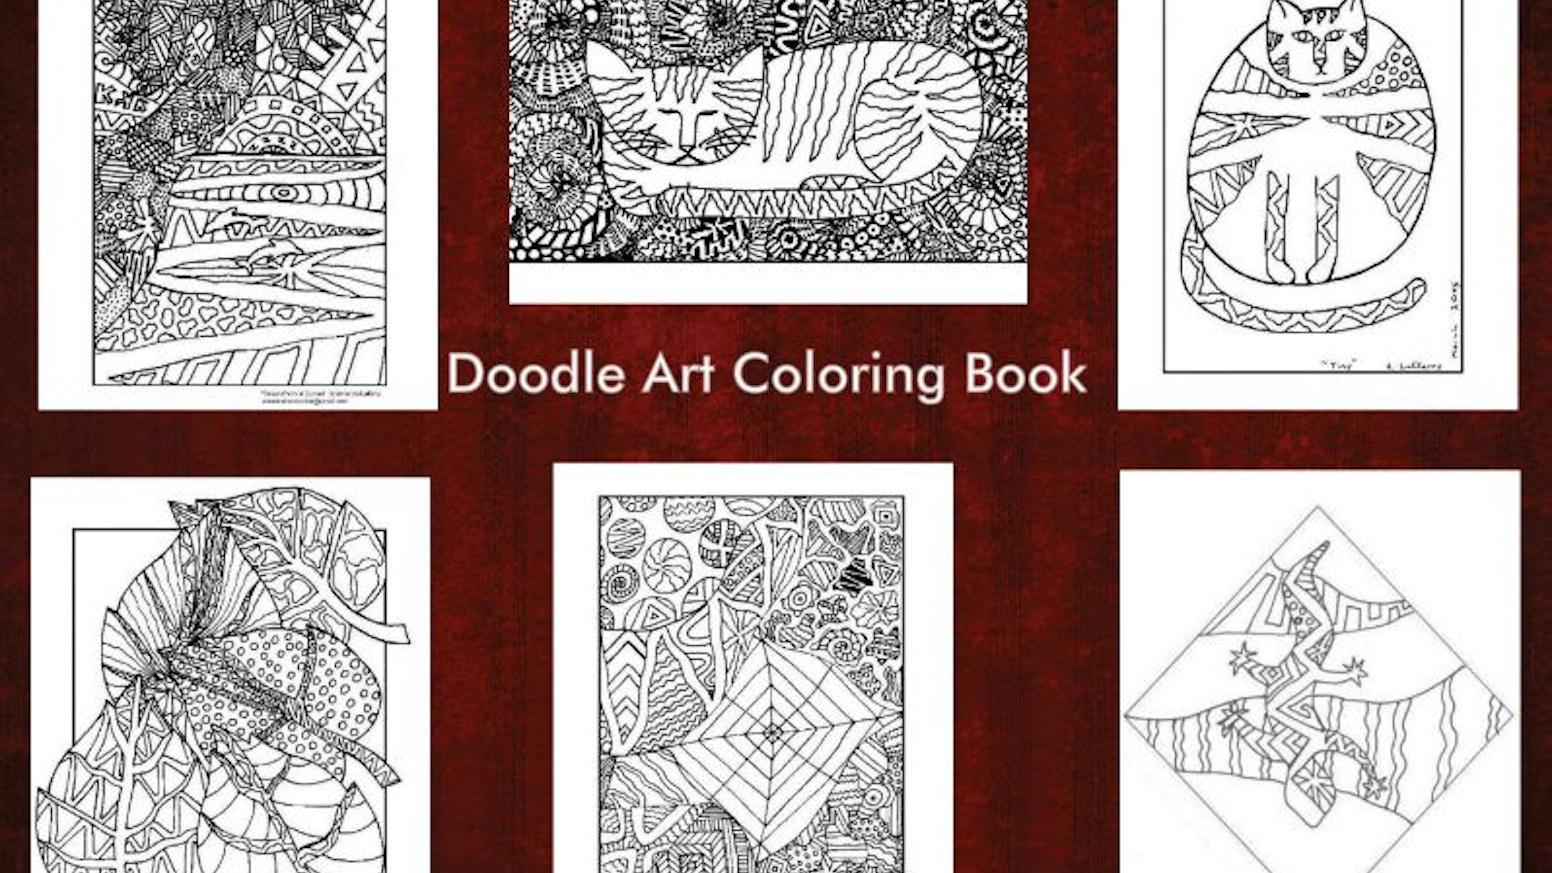 Doodle Art Coloring Book by Amanda the Doodler — Kickstarter